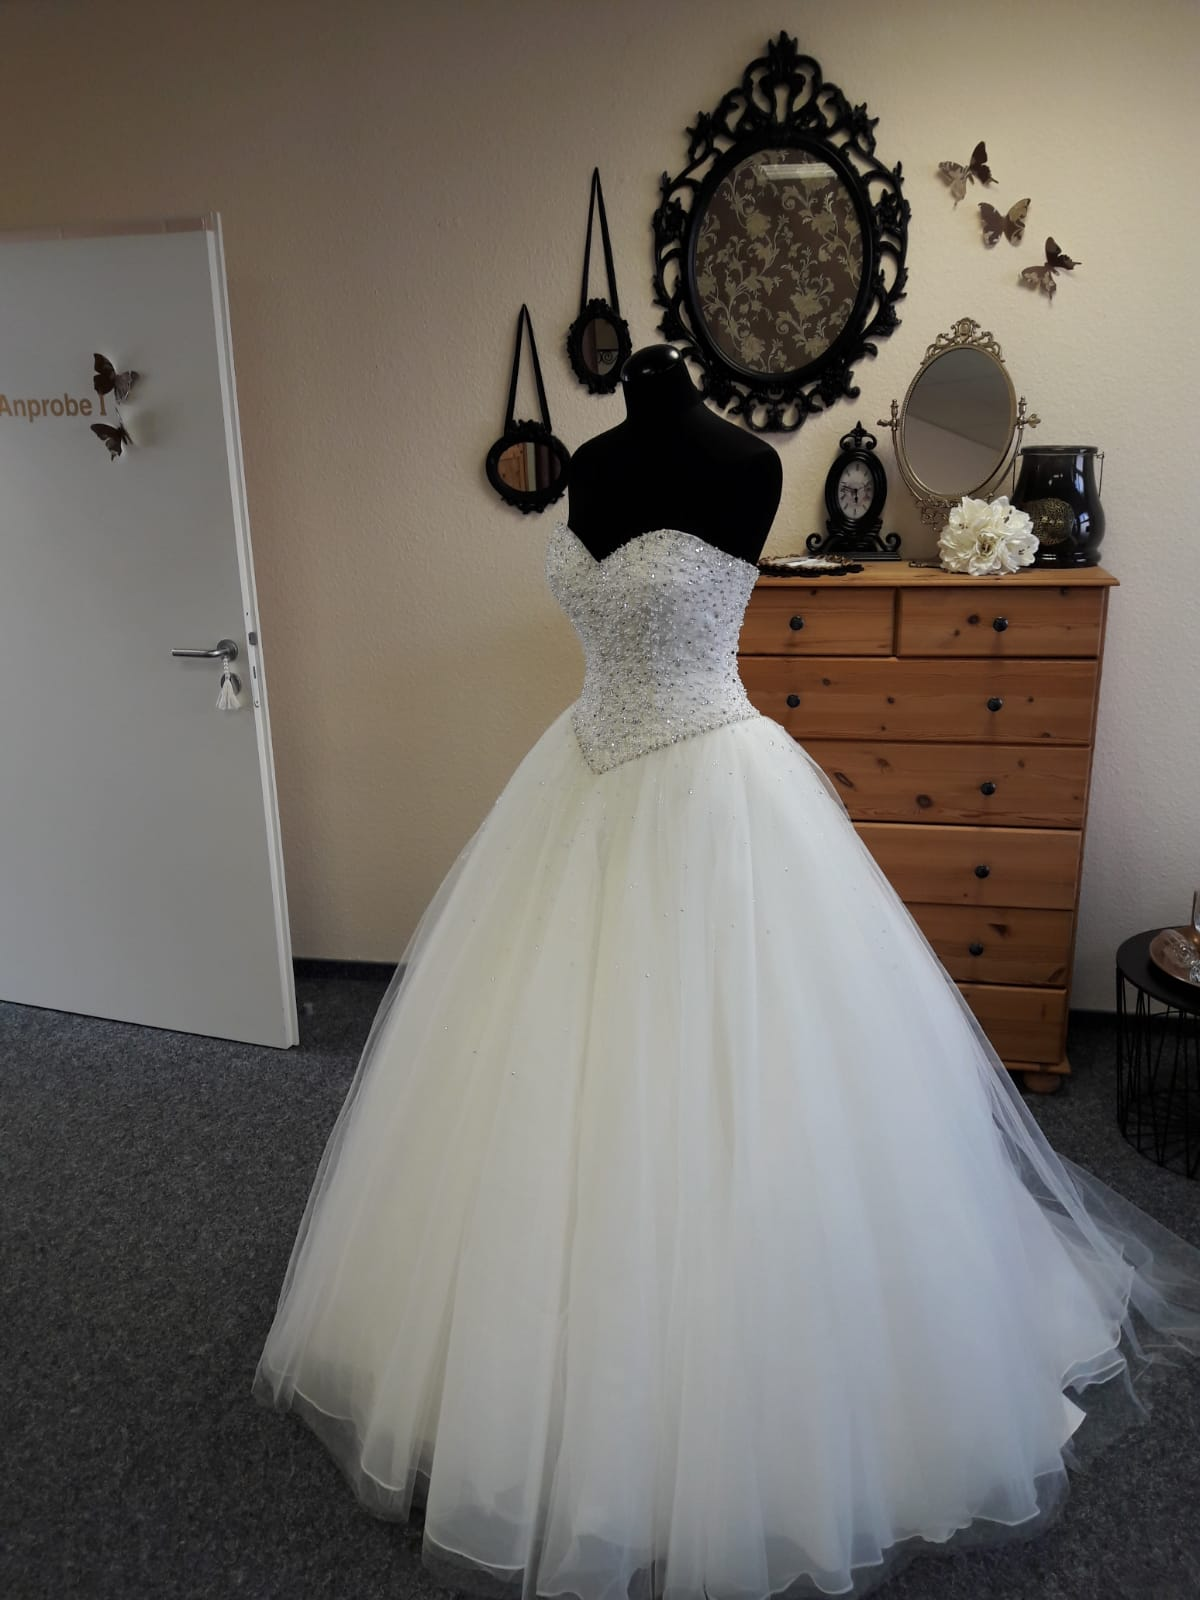 Klassik-Moderne-Glitzer-Brautkleid-18-18 - Brautparadies Jordan